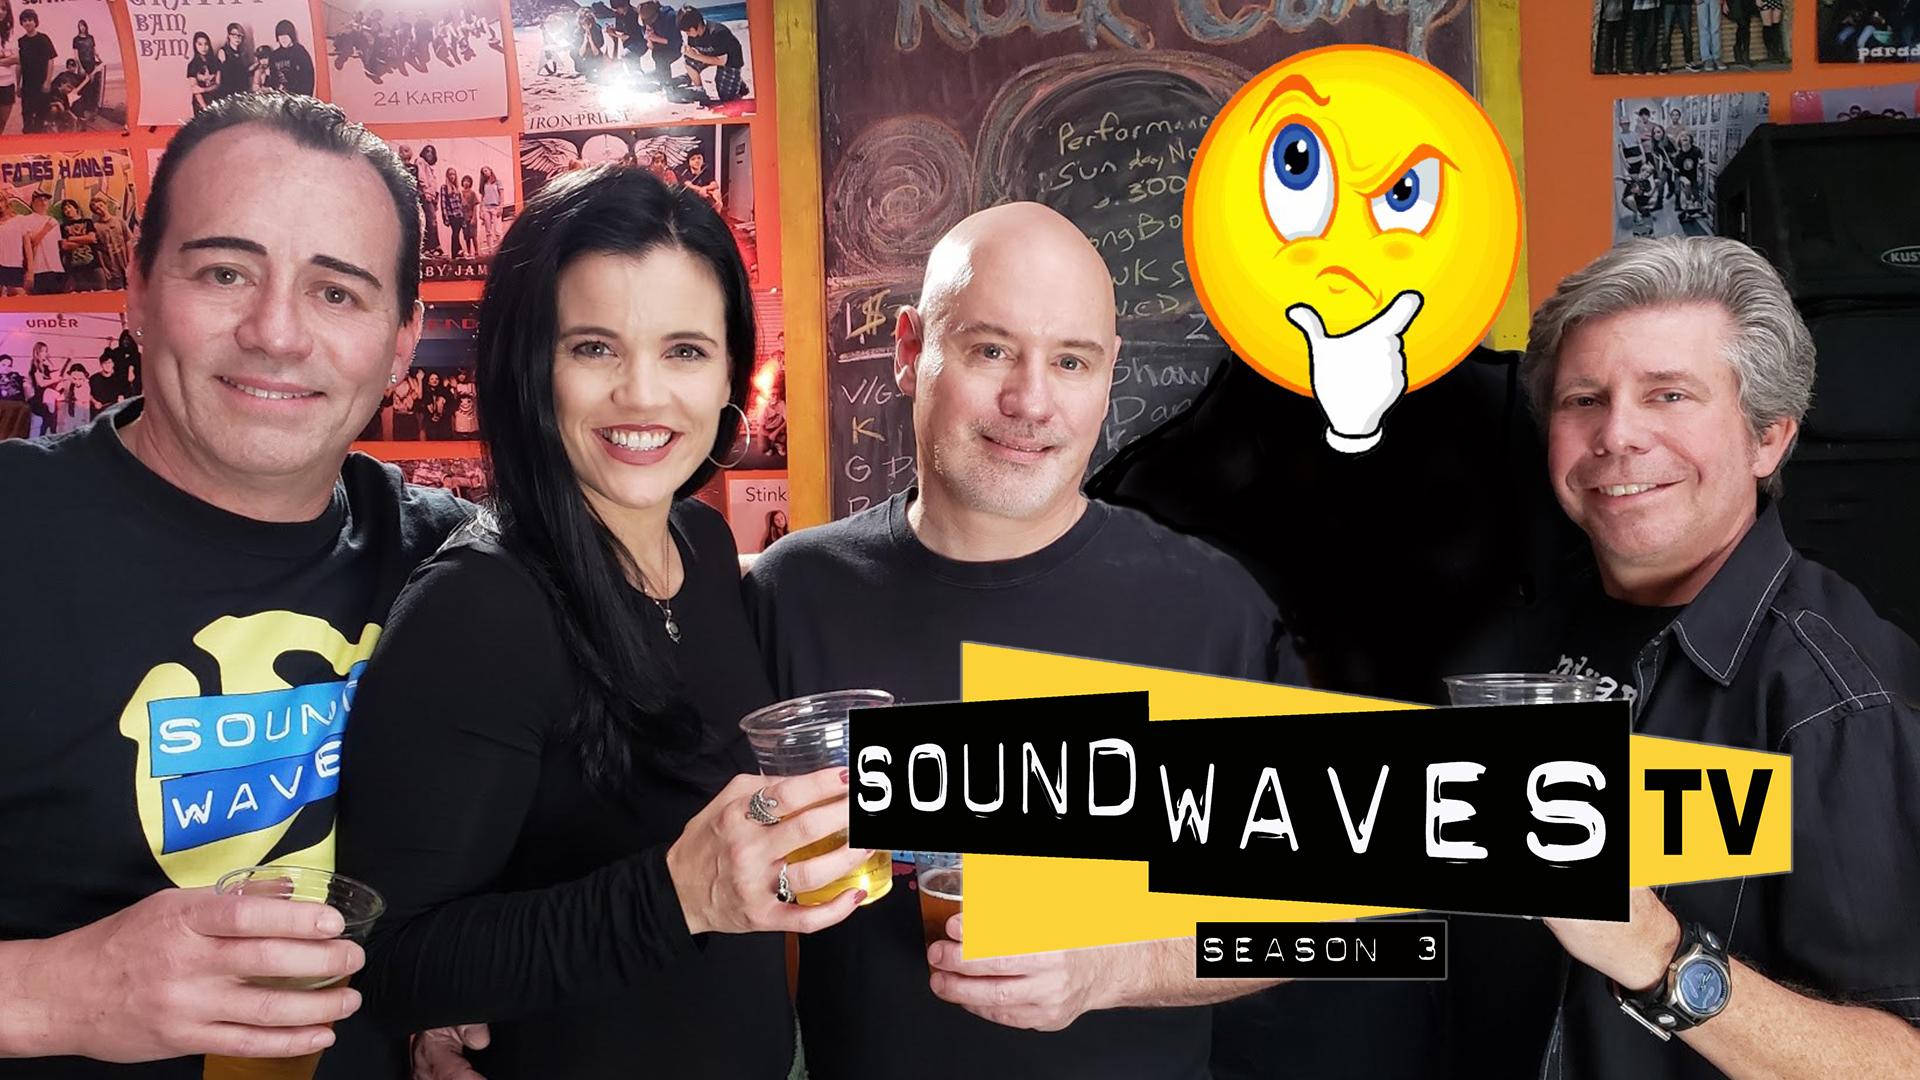 Watch the Season 3 premiere of Soundwaves TV